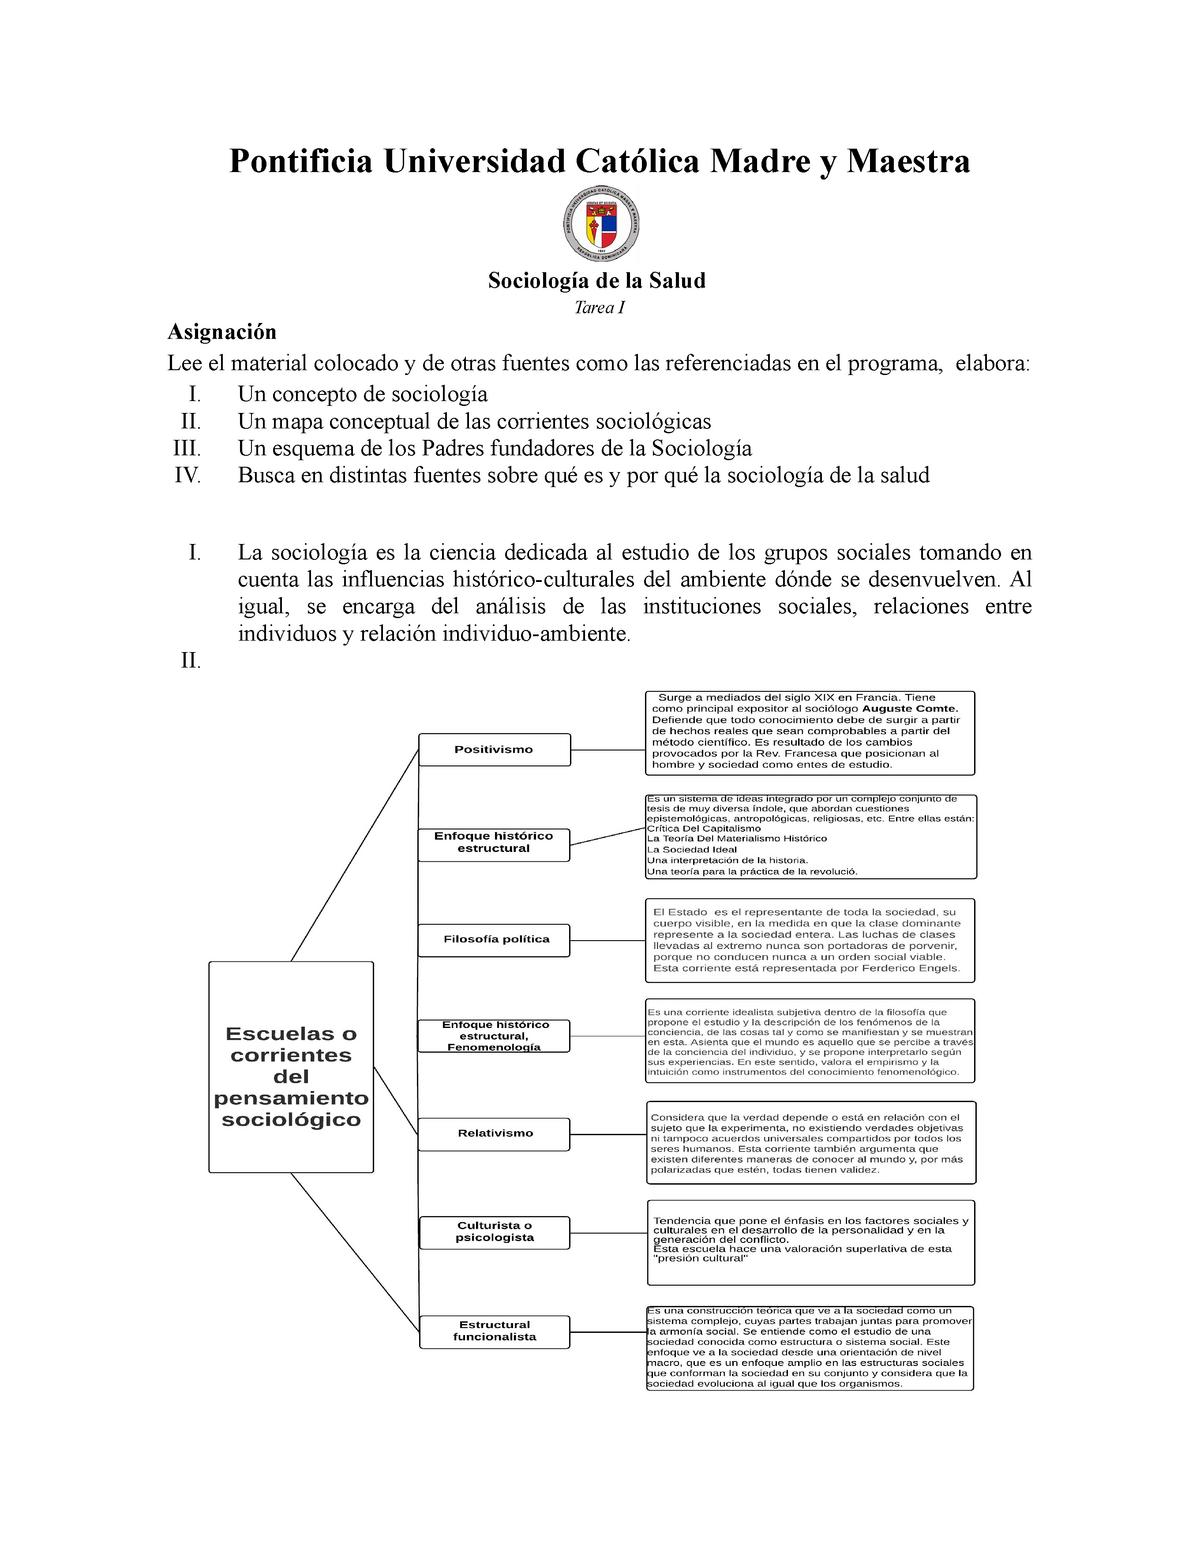 Tarea De Sociología De La Salud Tss 107 T Pucmm Studocu